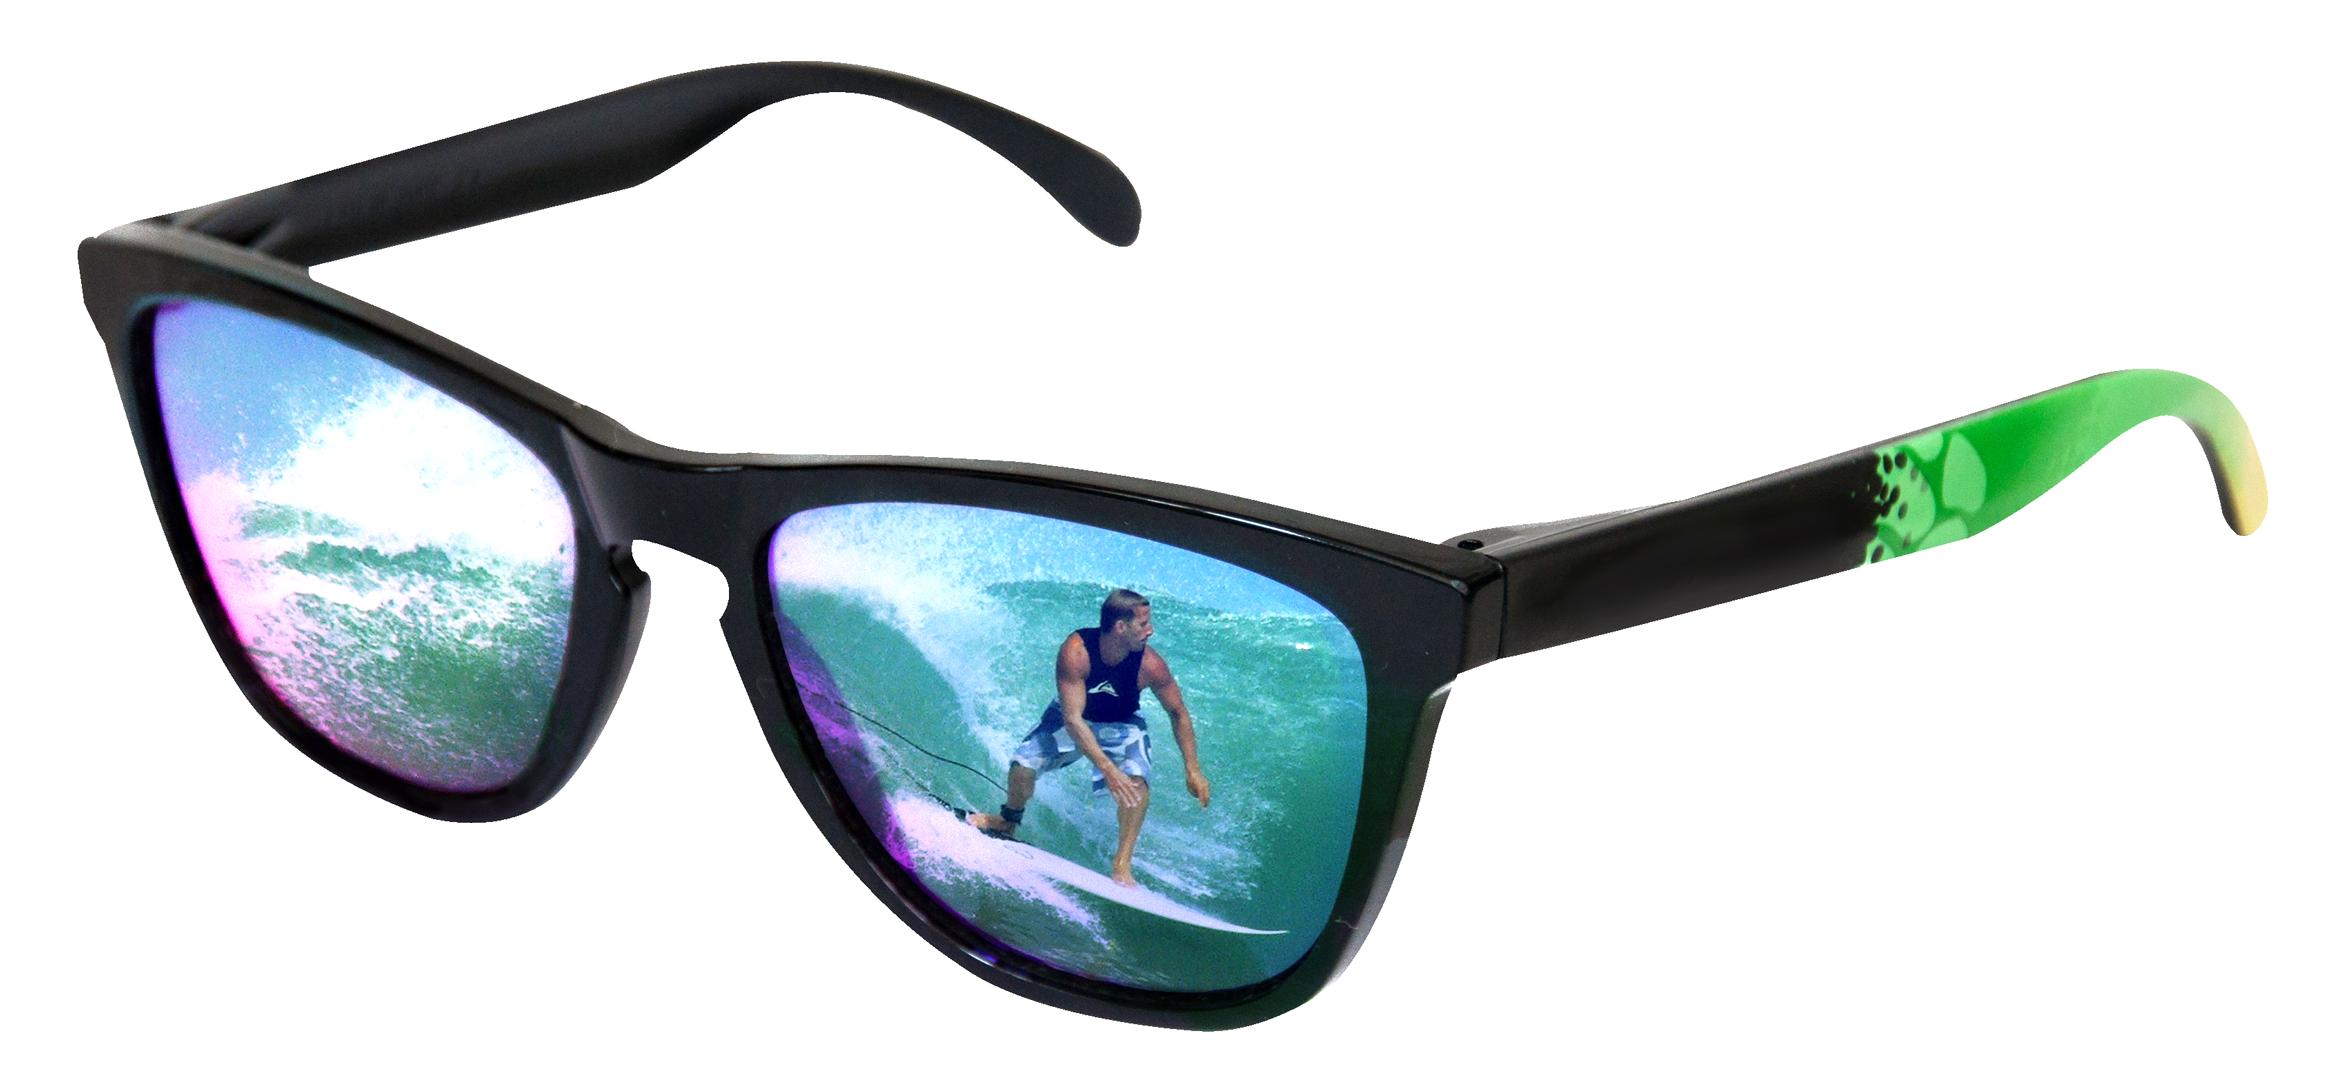 Sunglass PNG Transparent Sunglass